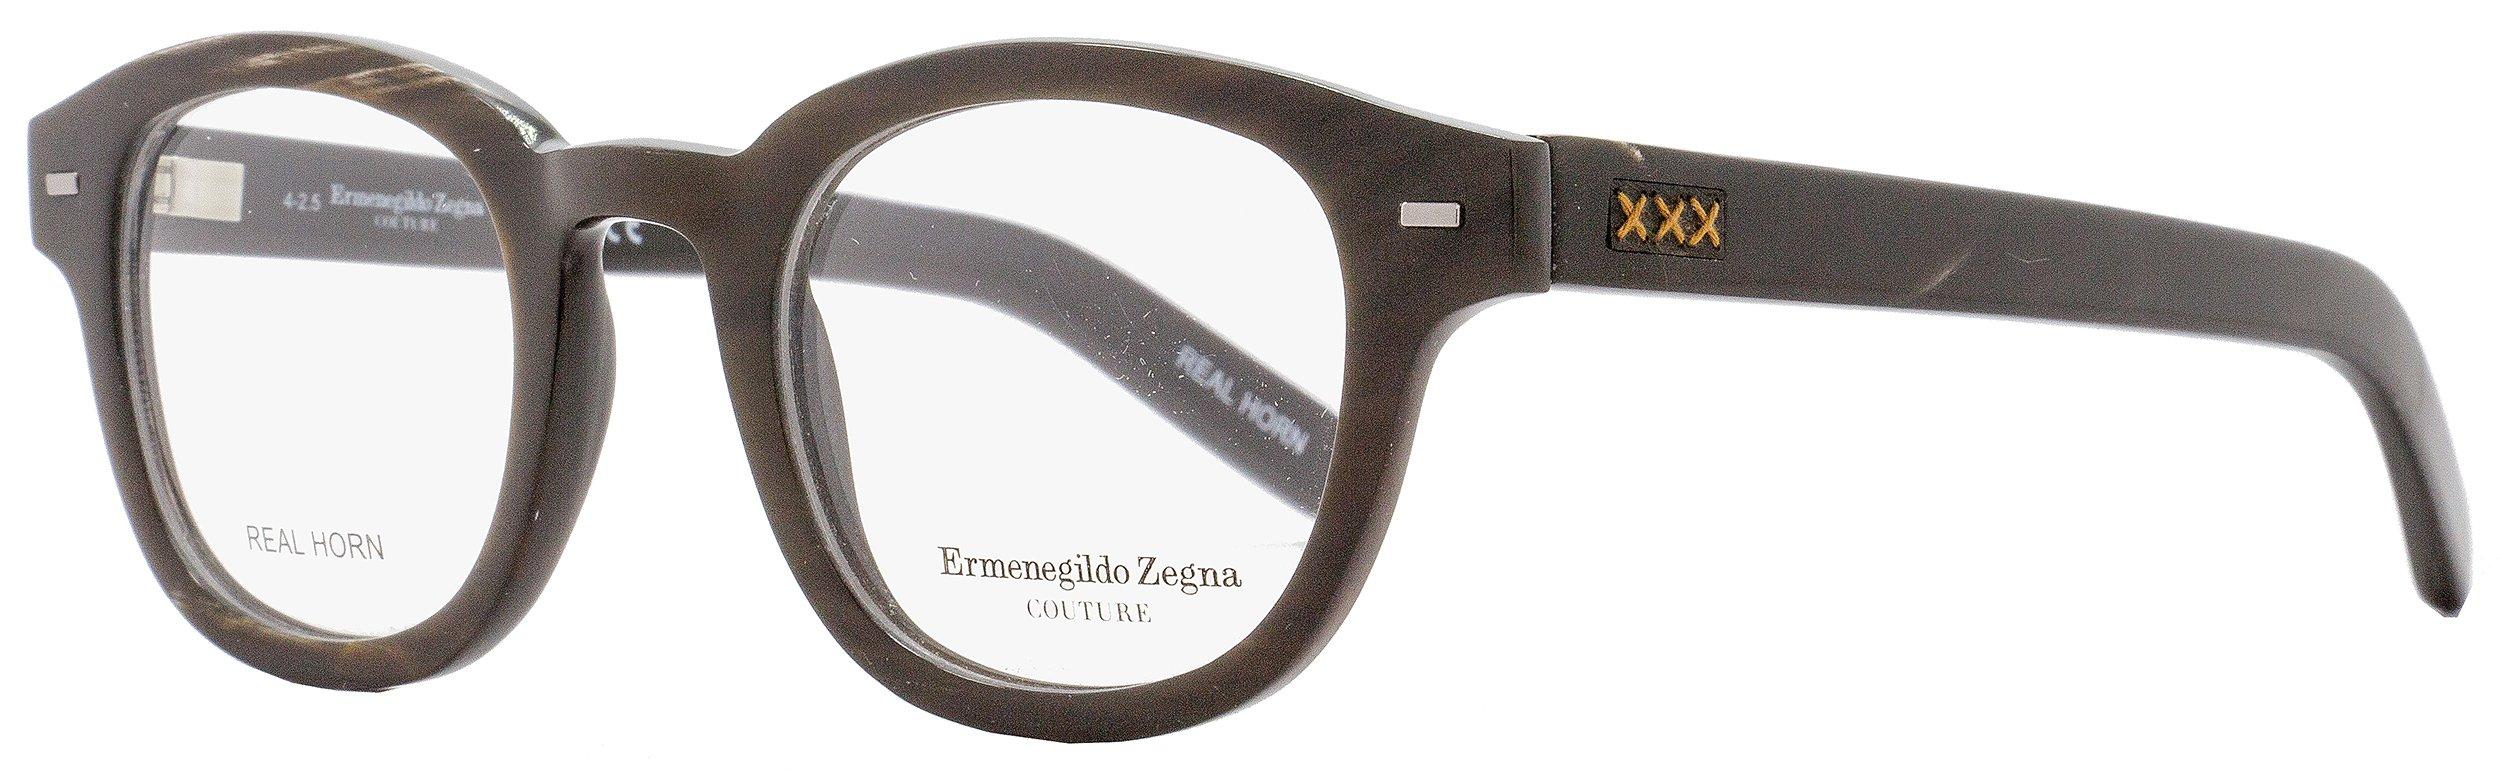 Ermenegildo Zegna Couture Prescription Eyeglasses - ZC5014 062 - Brown Horn